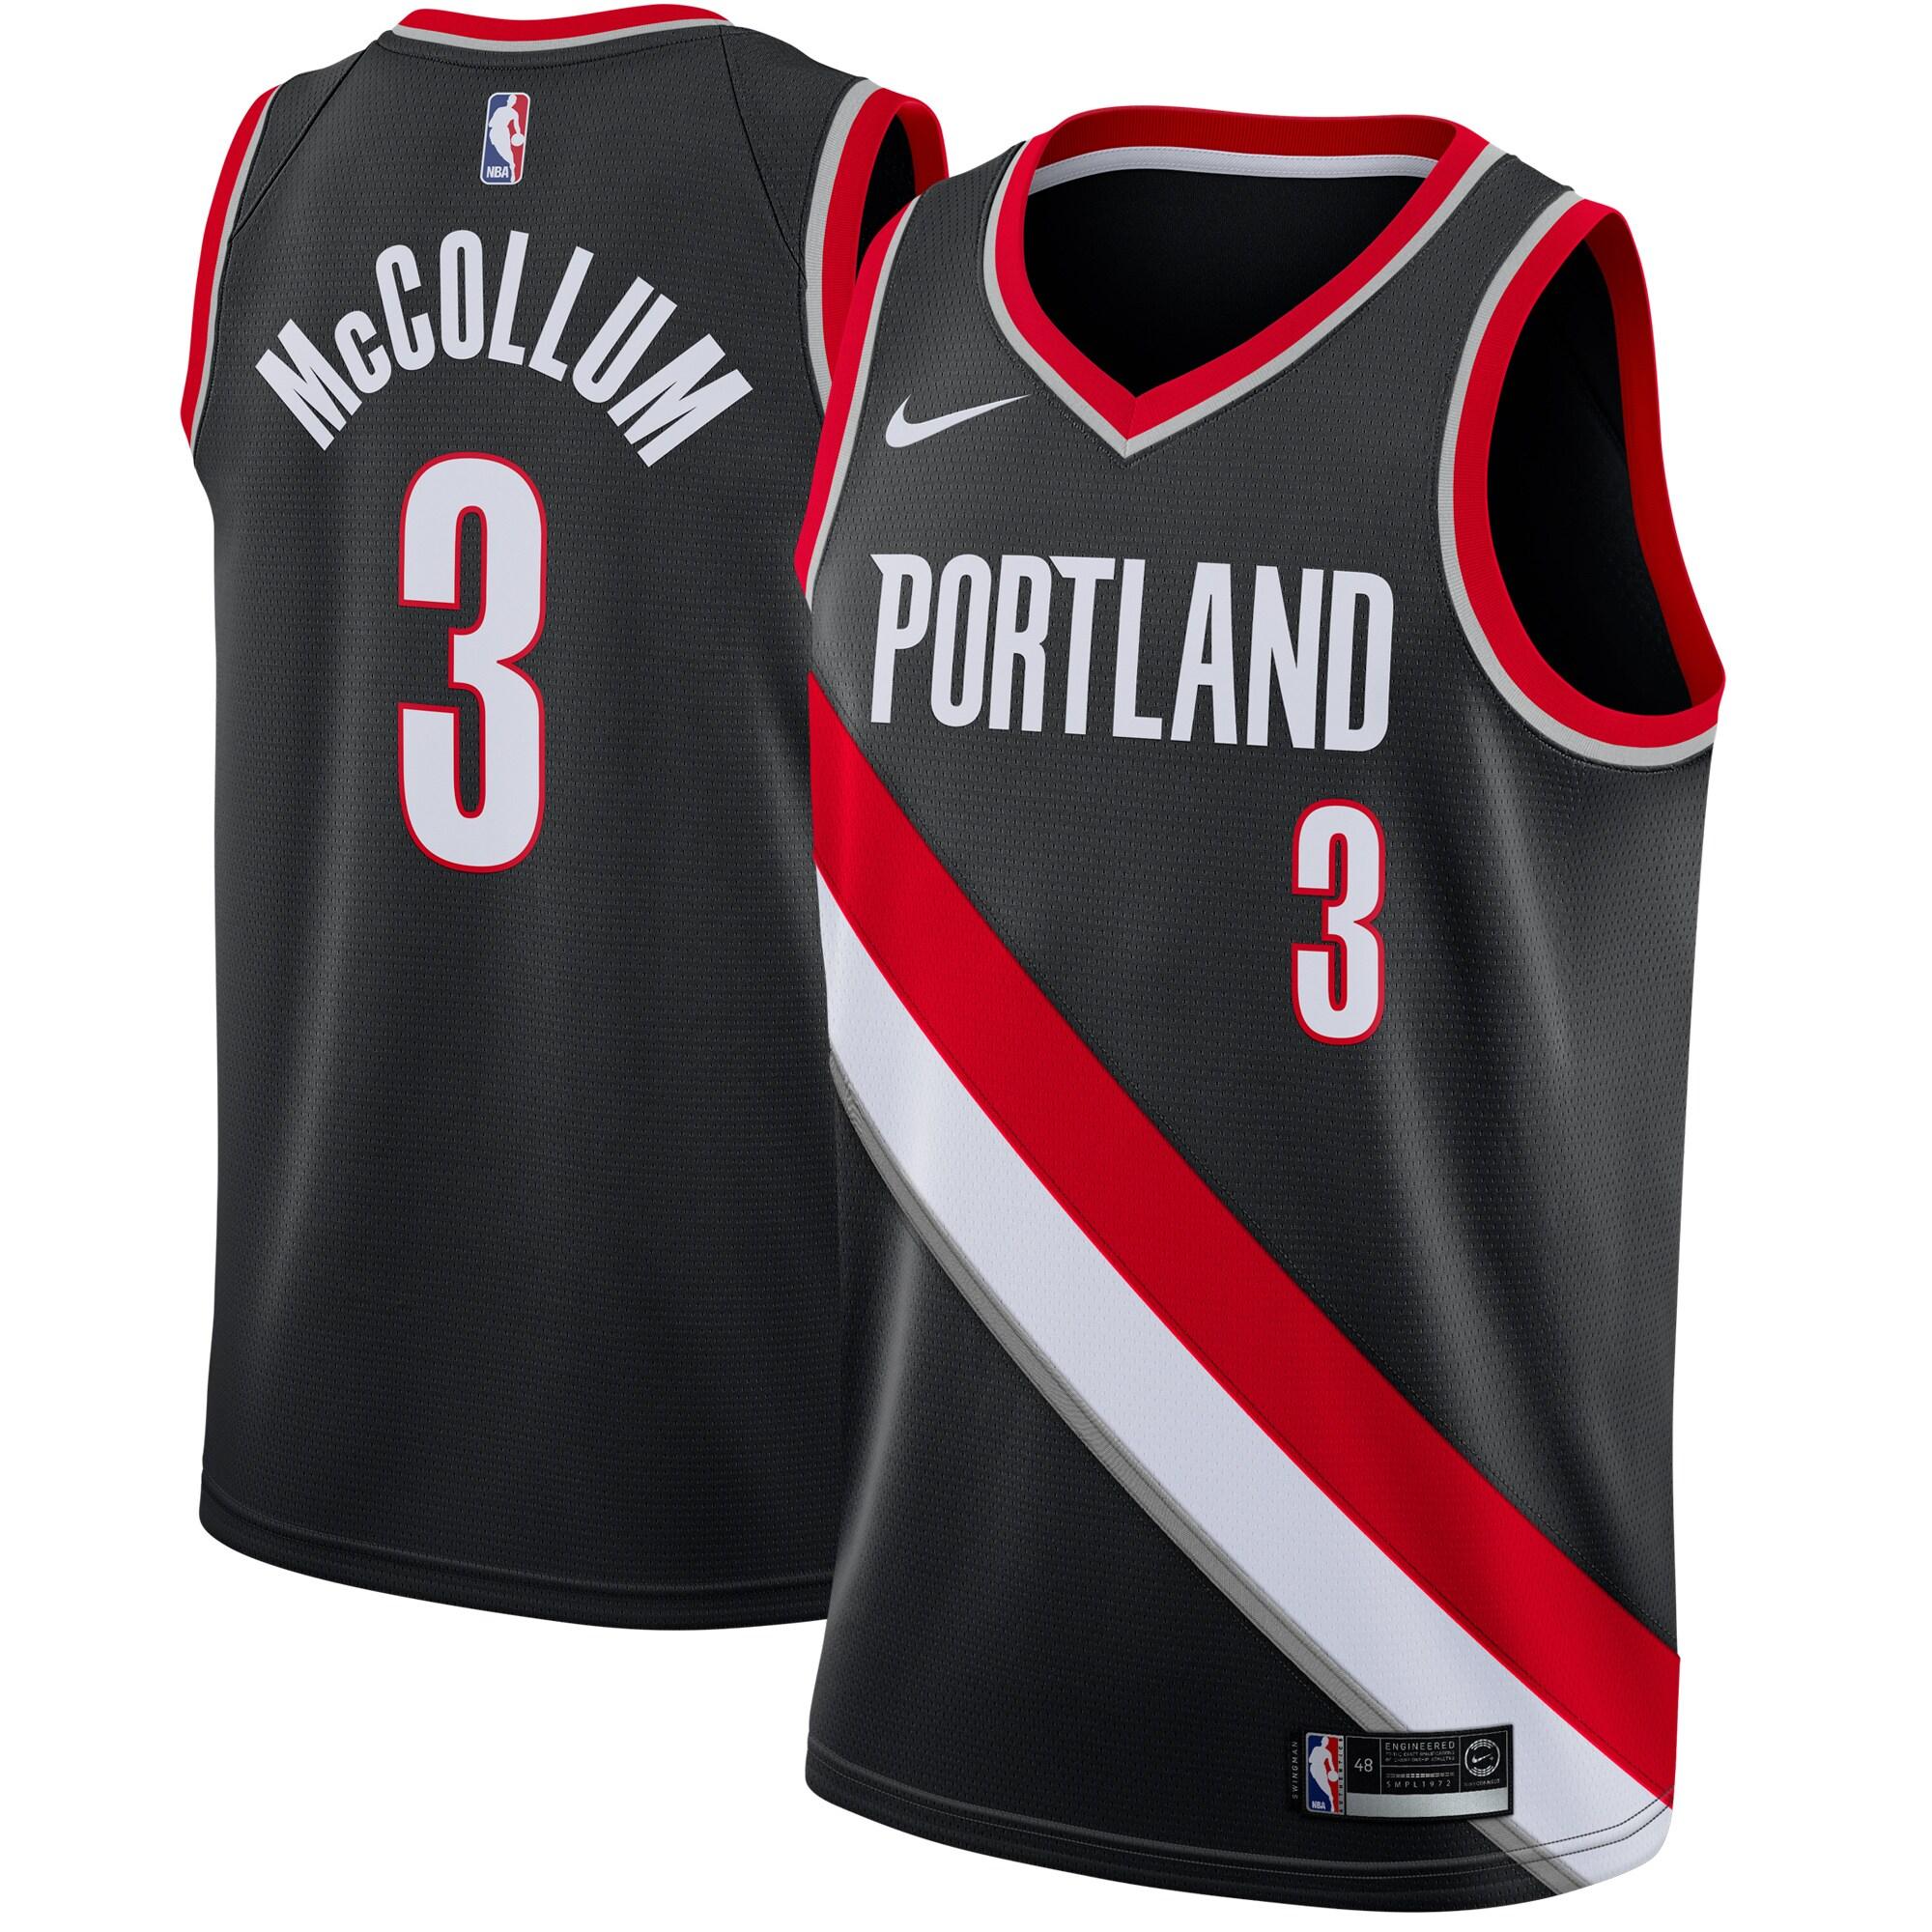 C.J. McCollum Portland Trail Blazers Nike Swingman Jersey Black - Icon Edition